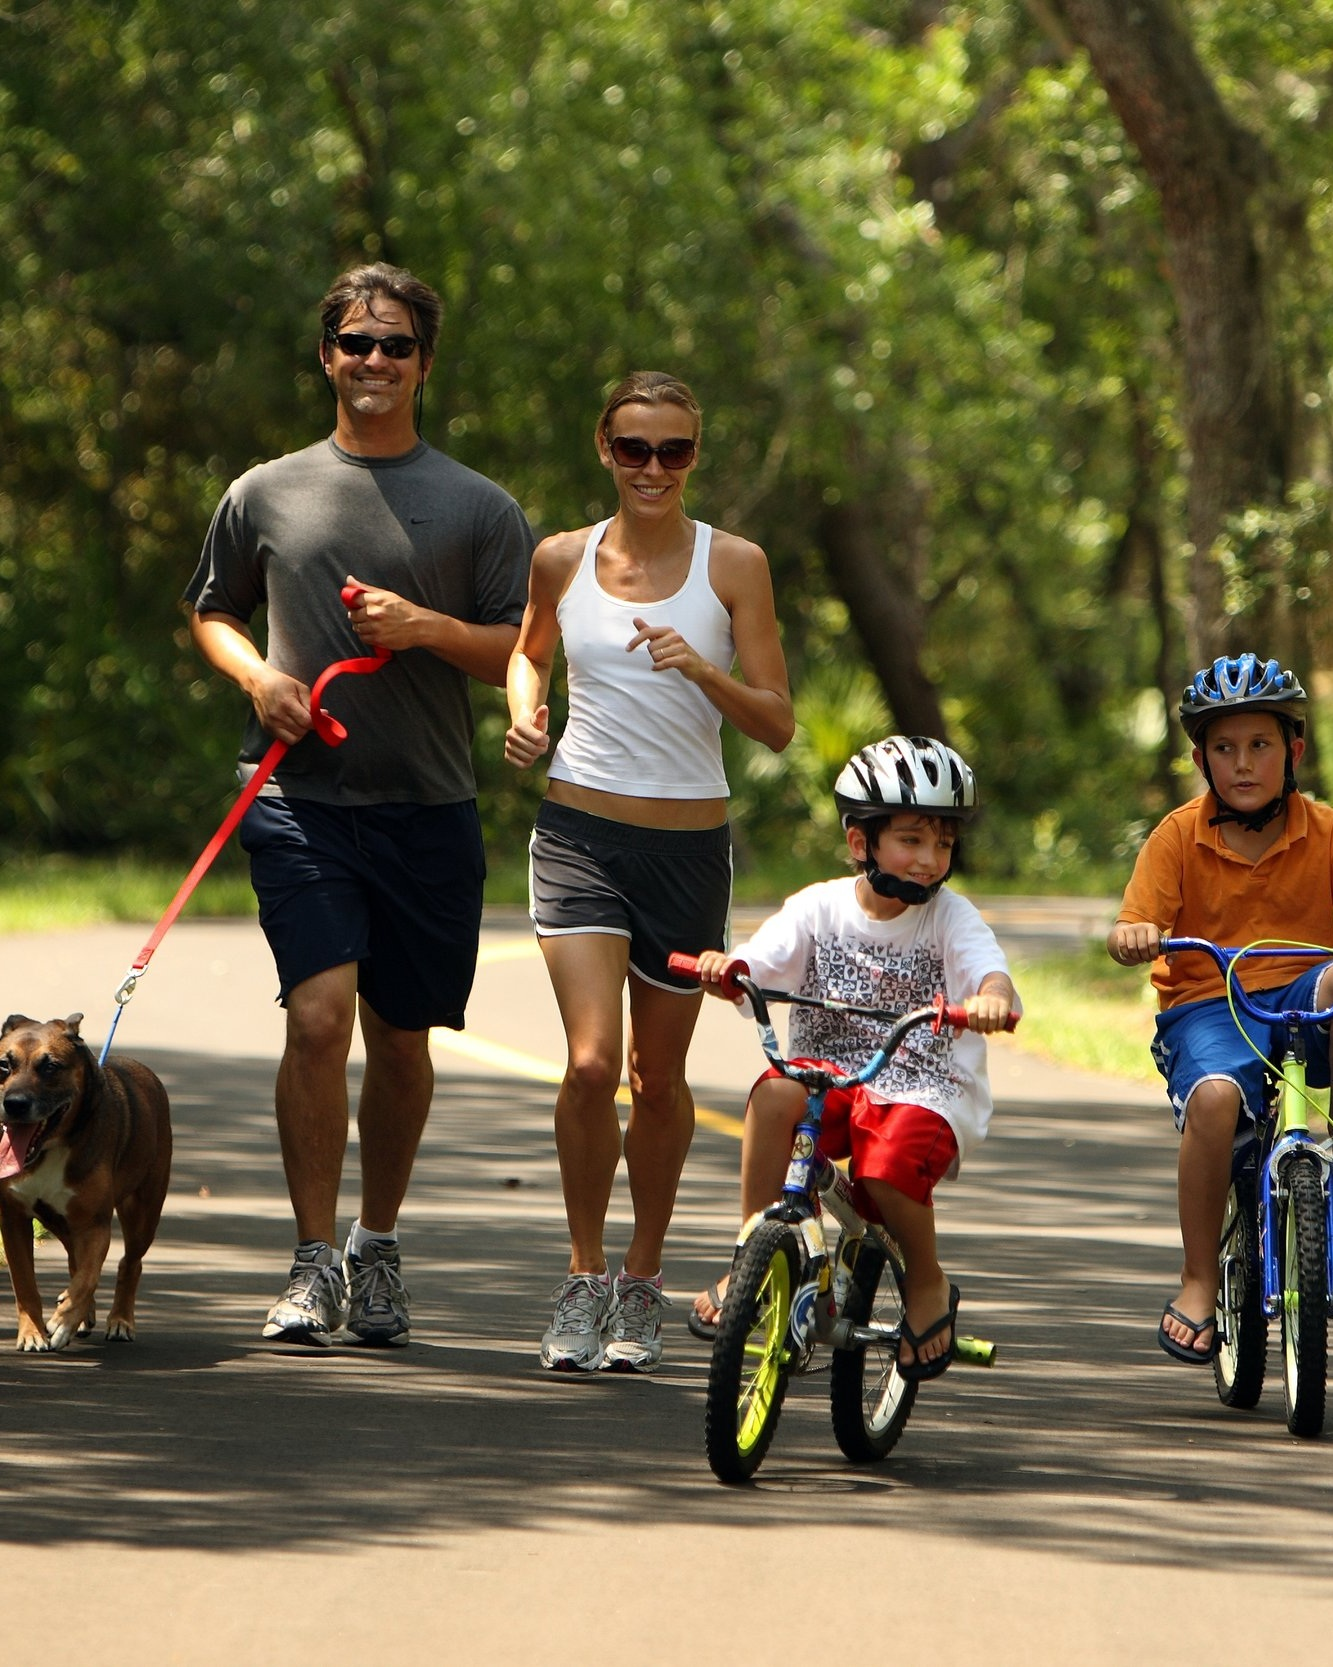 family+biking+jogging+trail.jpg